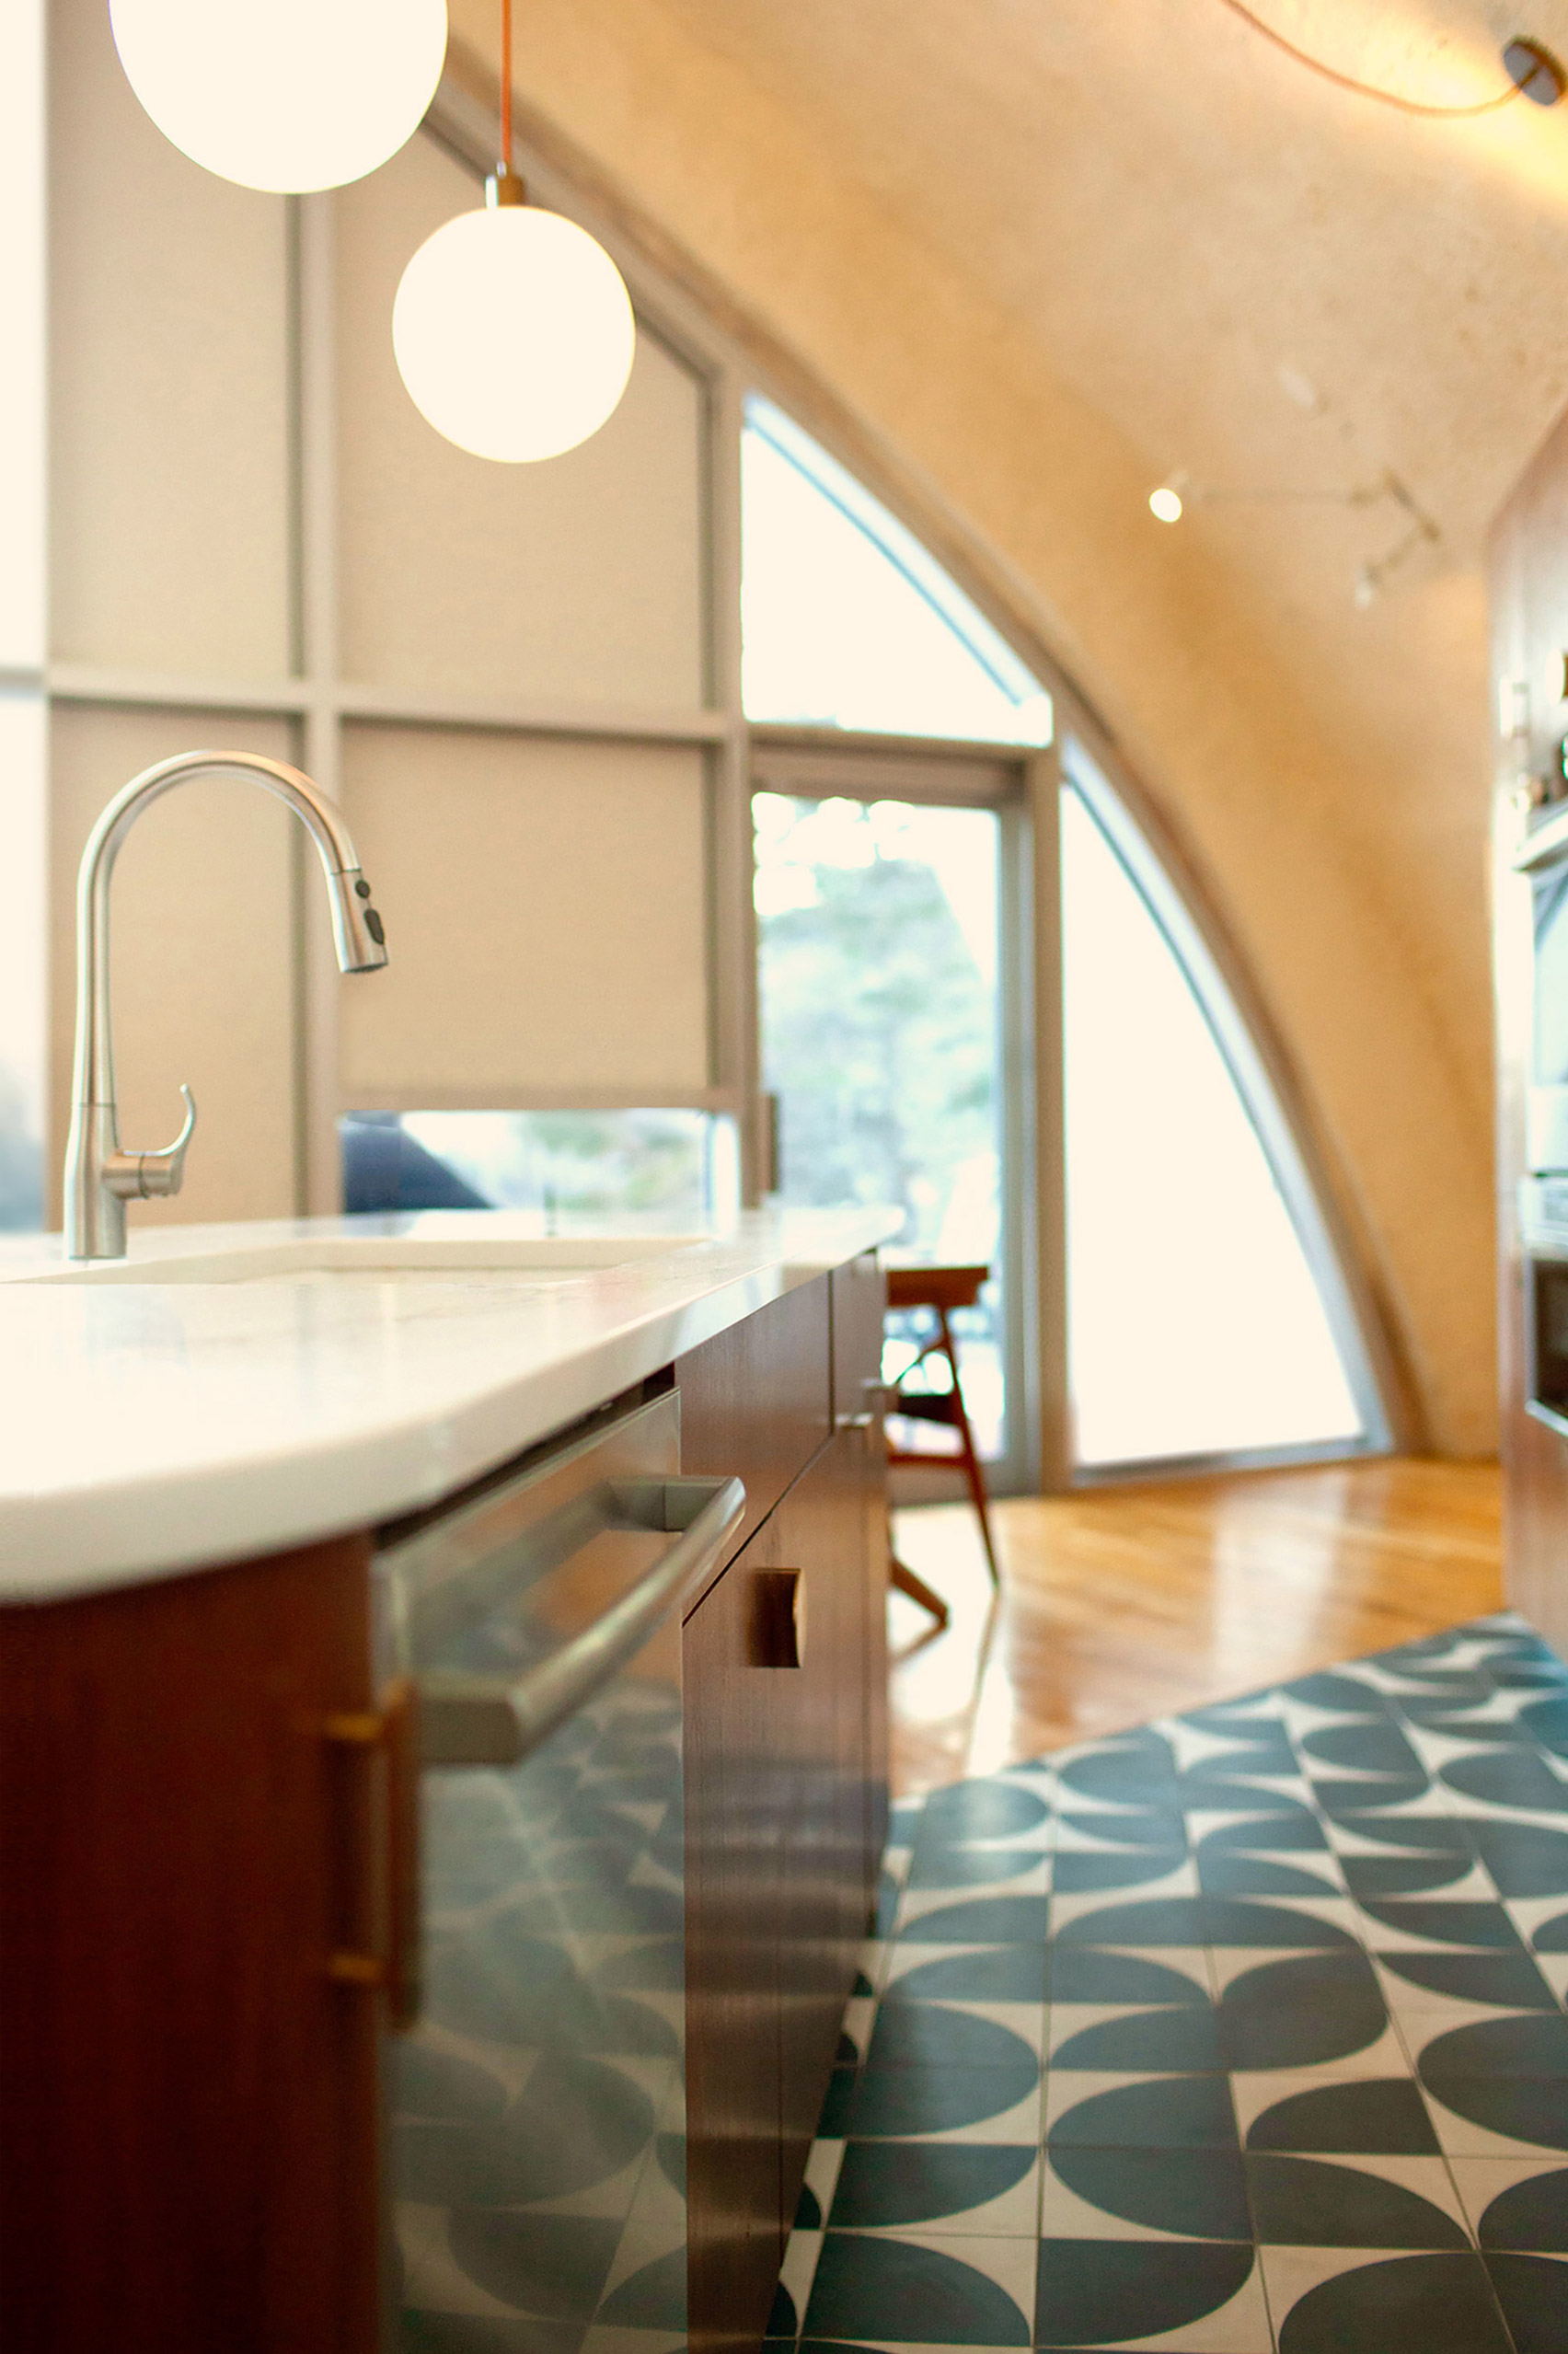 Ceramic tile kitchen floor of house in the Catskills